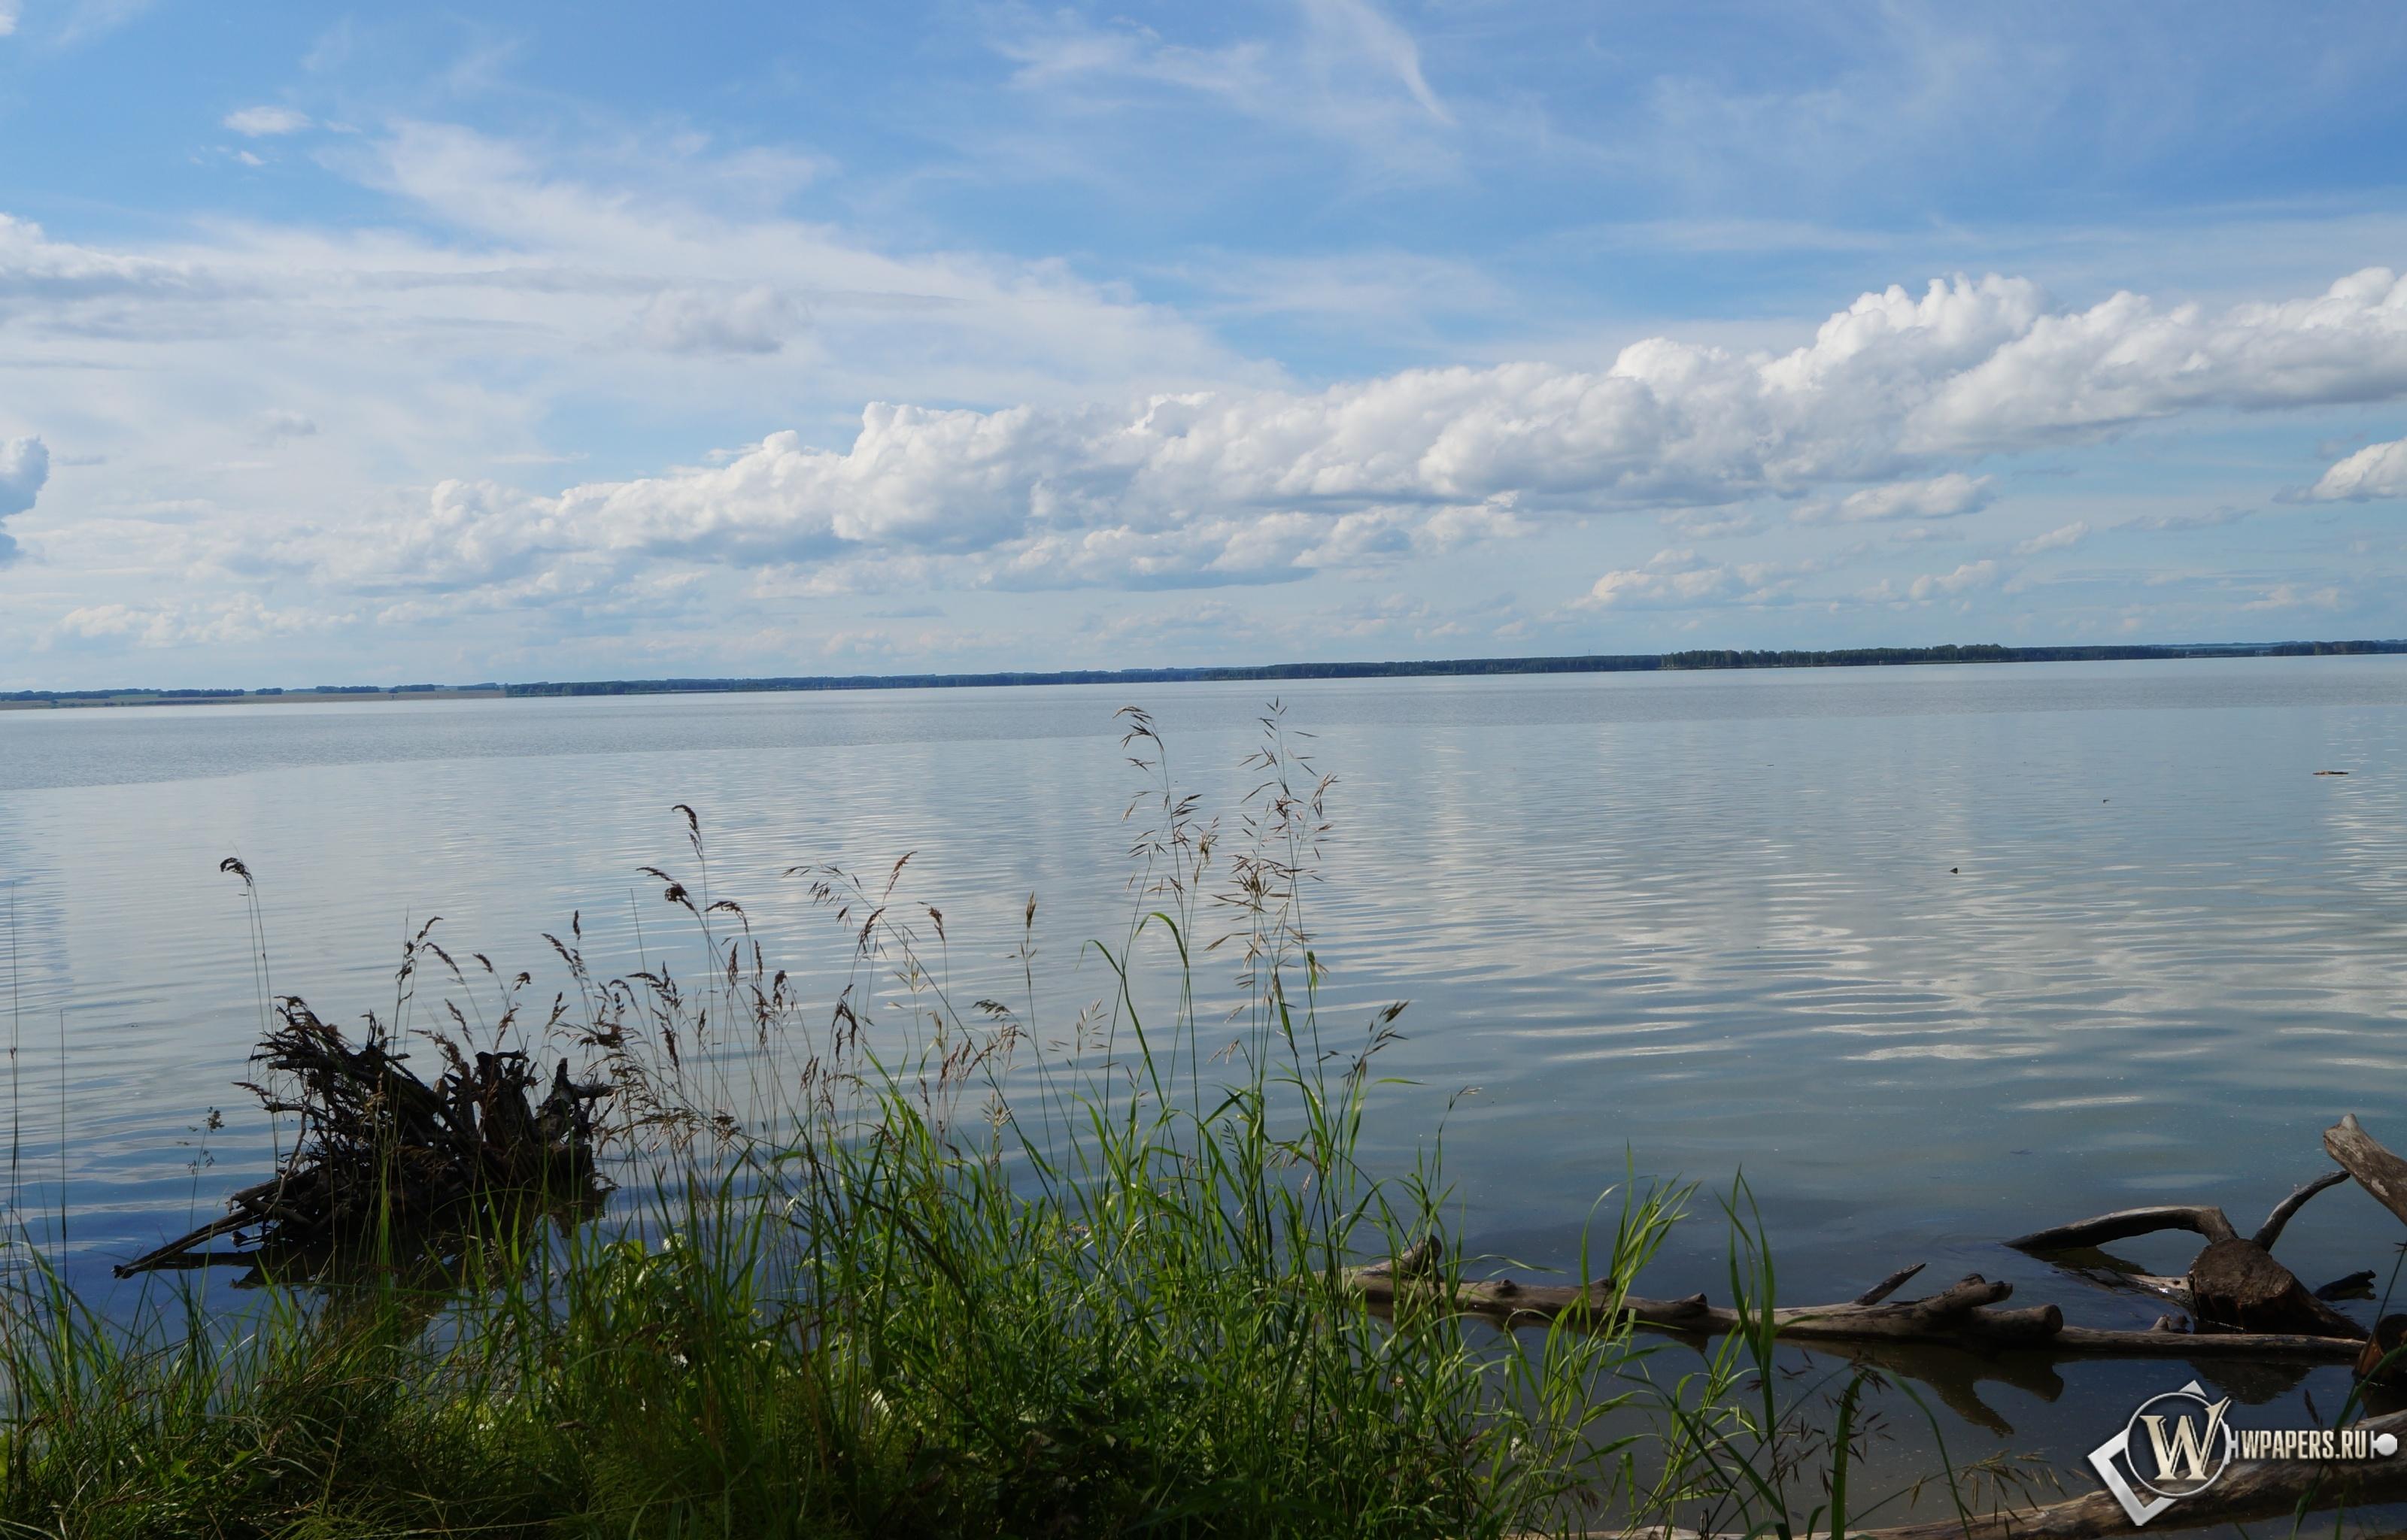 Обское озеро 3200x2048